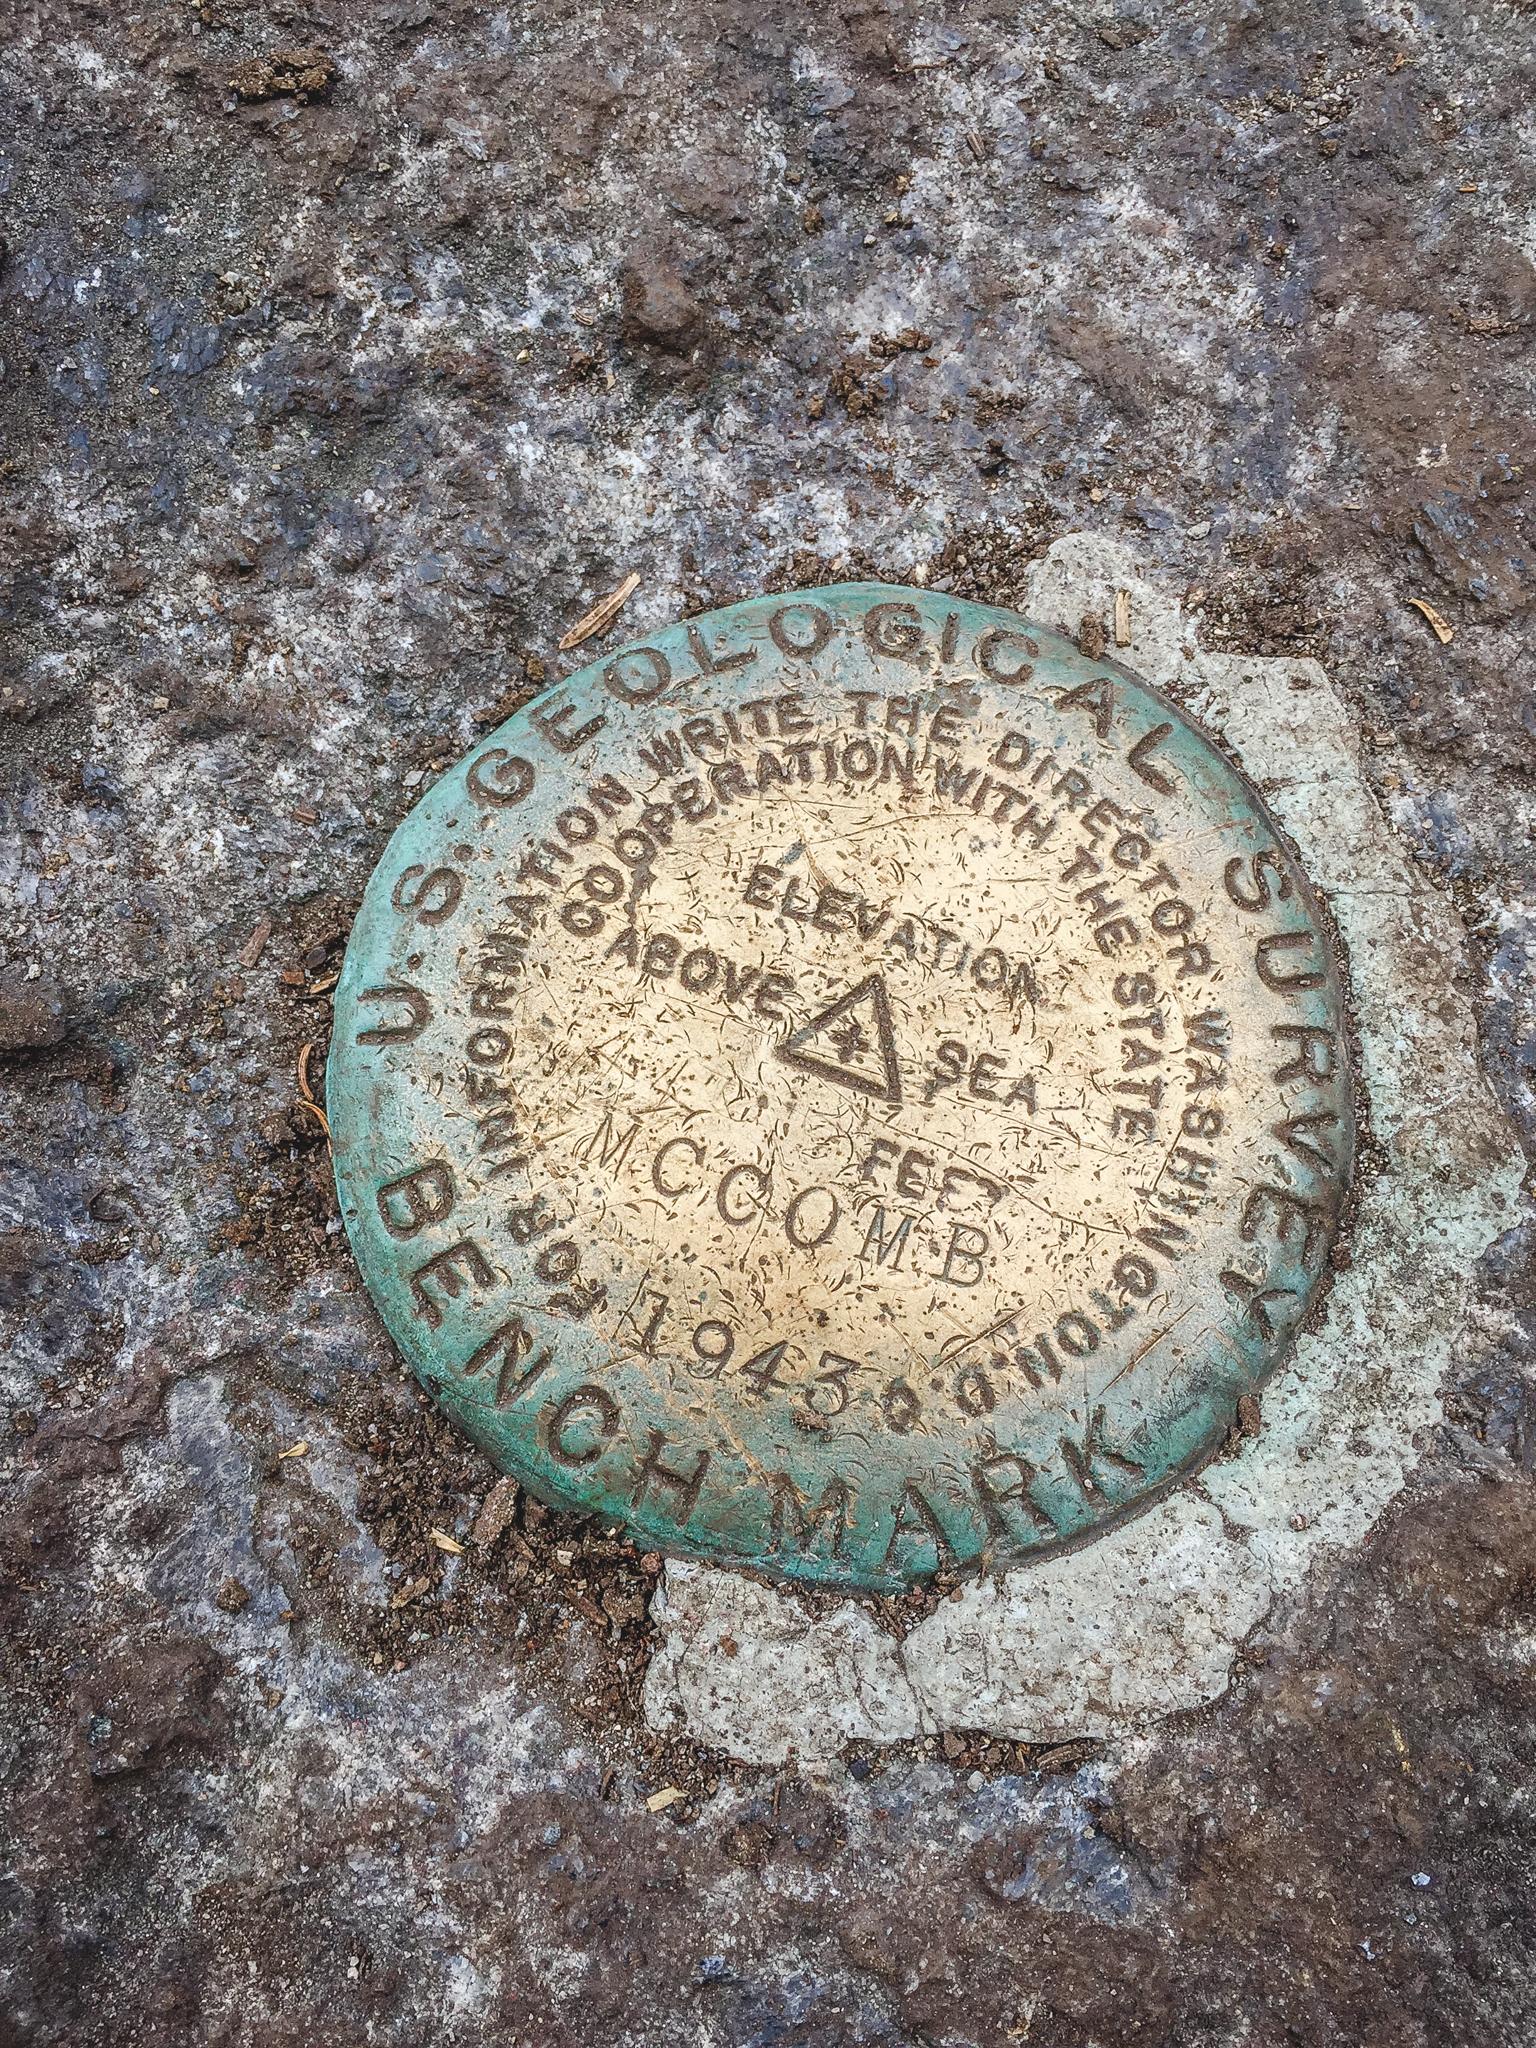 - Summit marker of Macomb